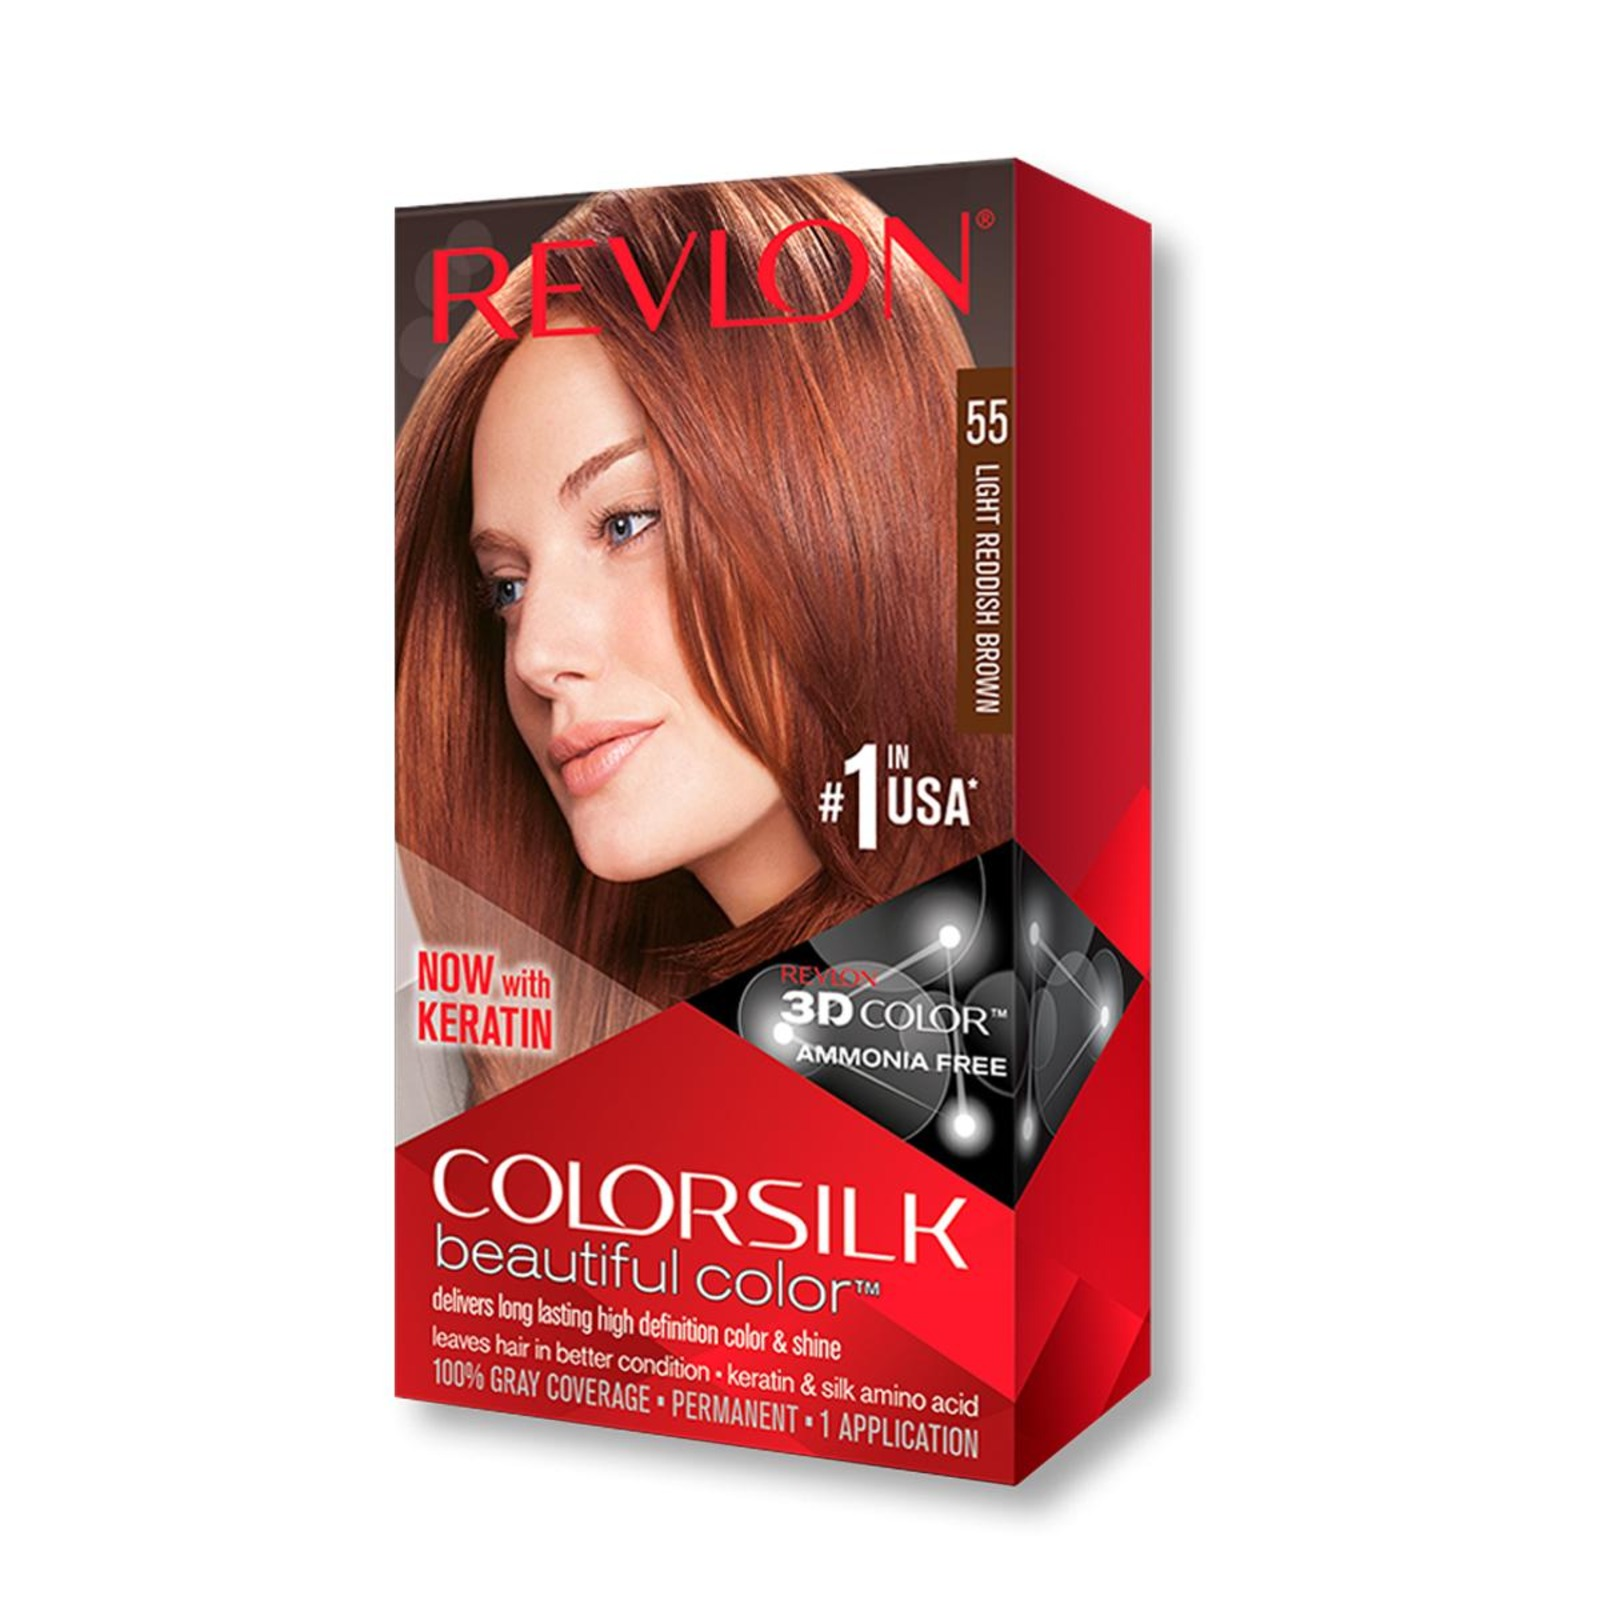 Revlon Colorsilk 3D Hair Color - 55 Light Reddish Brown